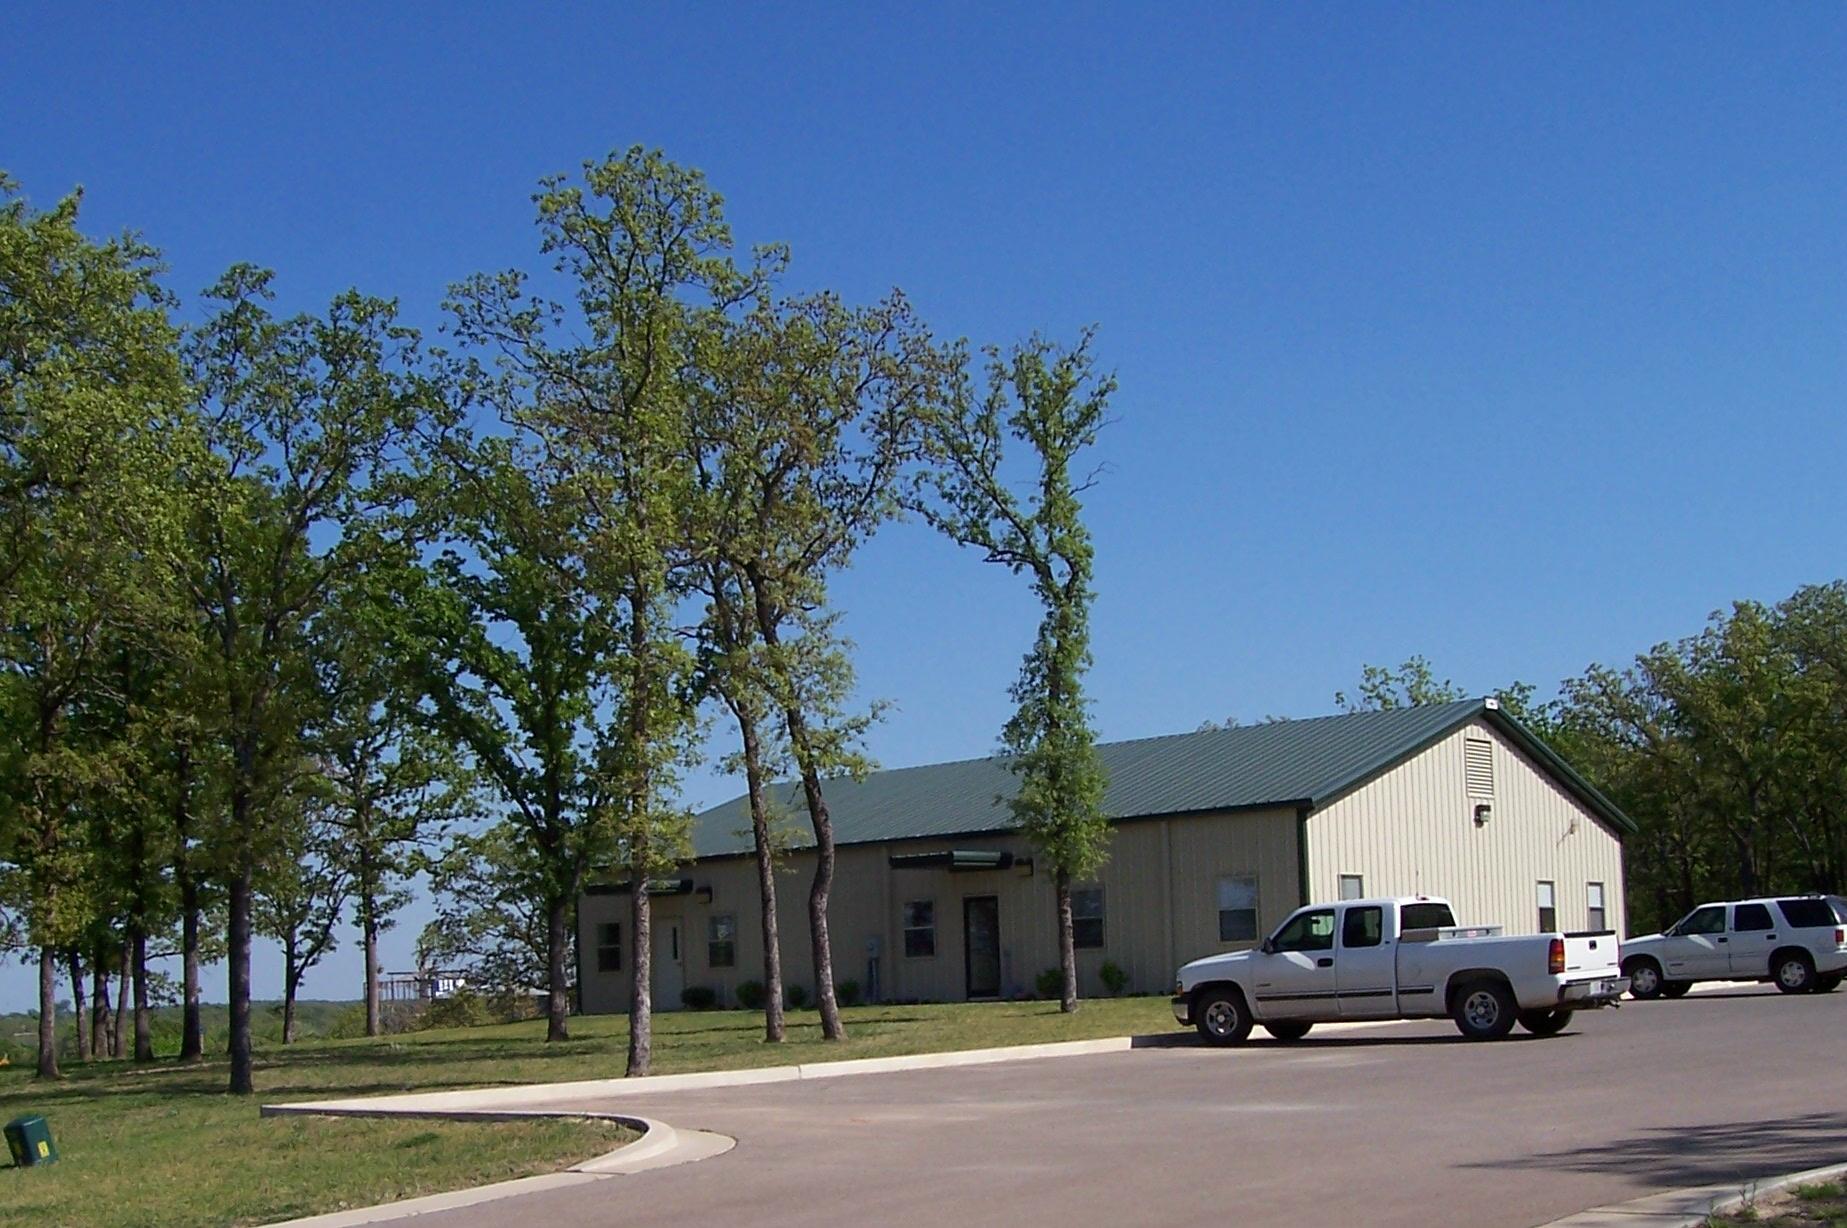 Southern Oklahoma Regional Disposal Service image 1